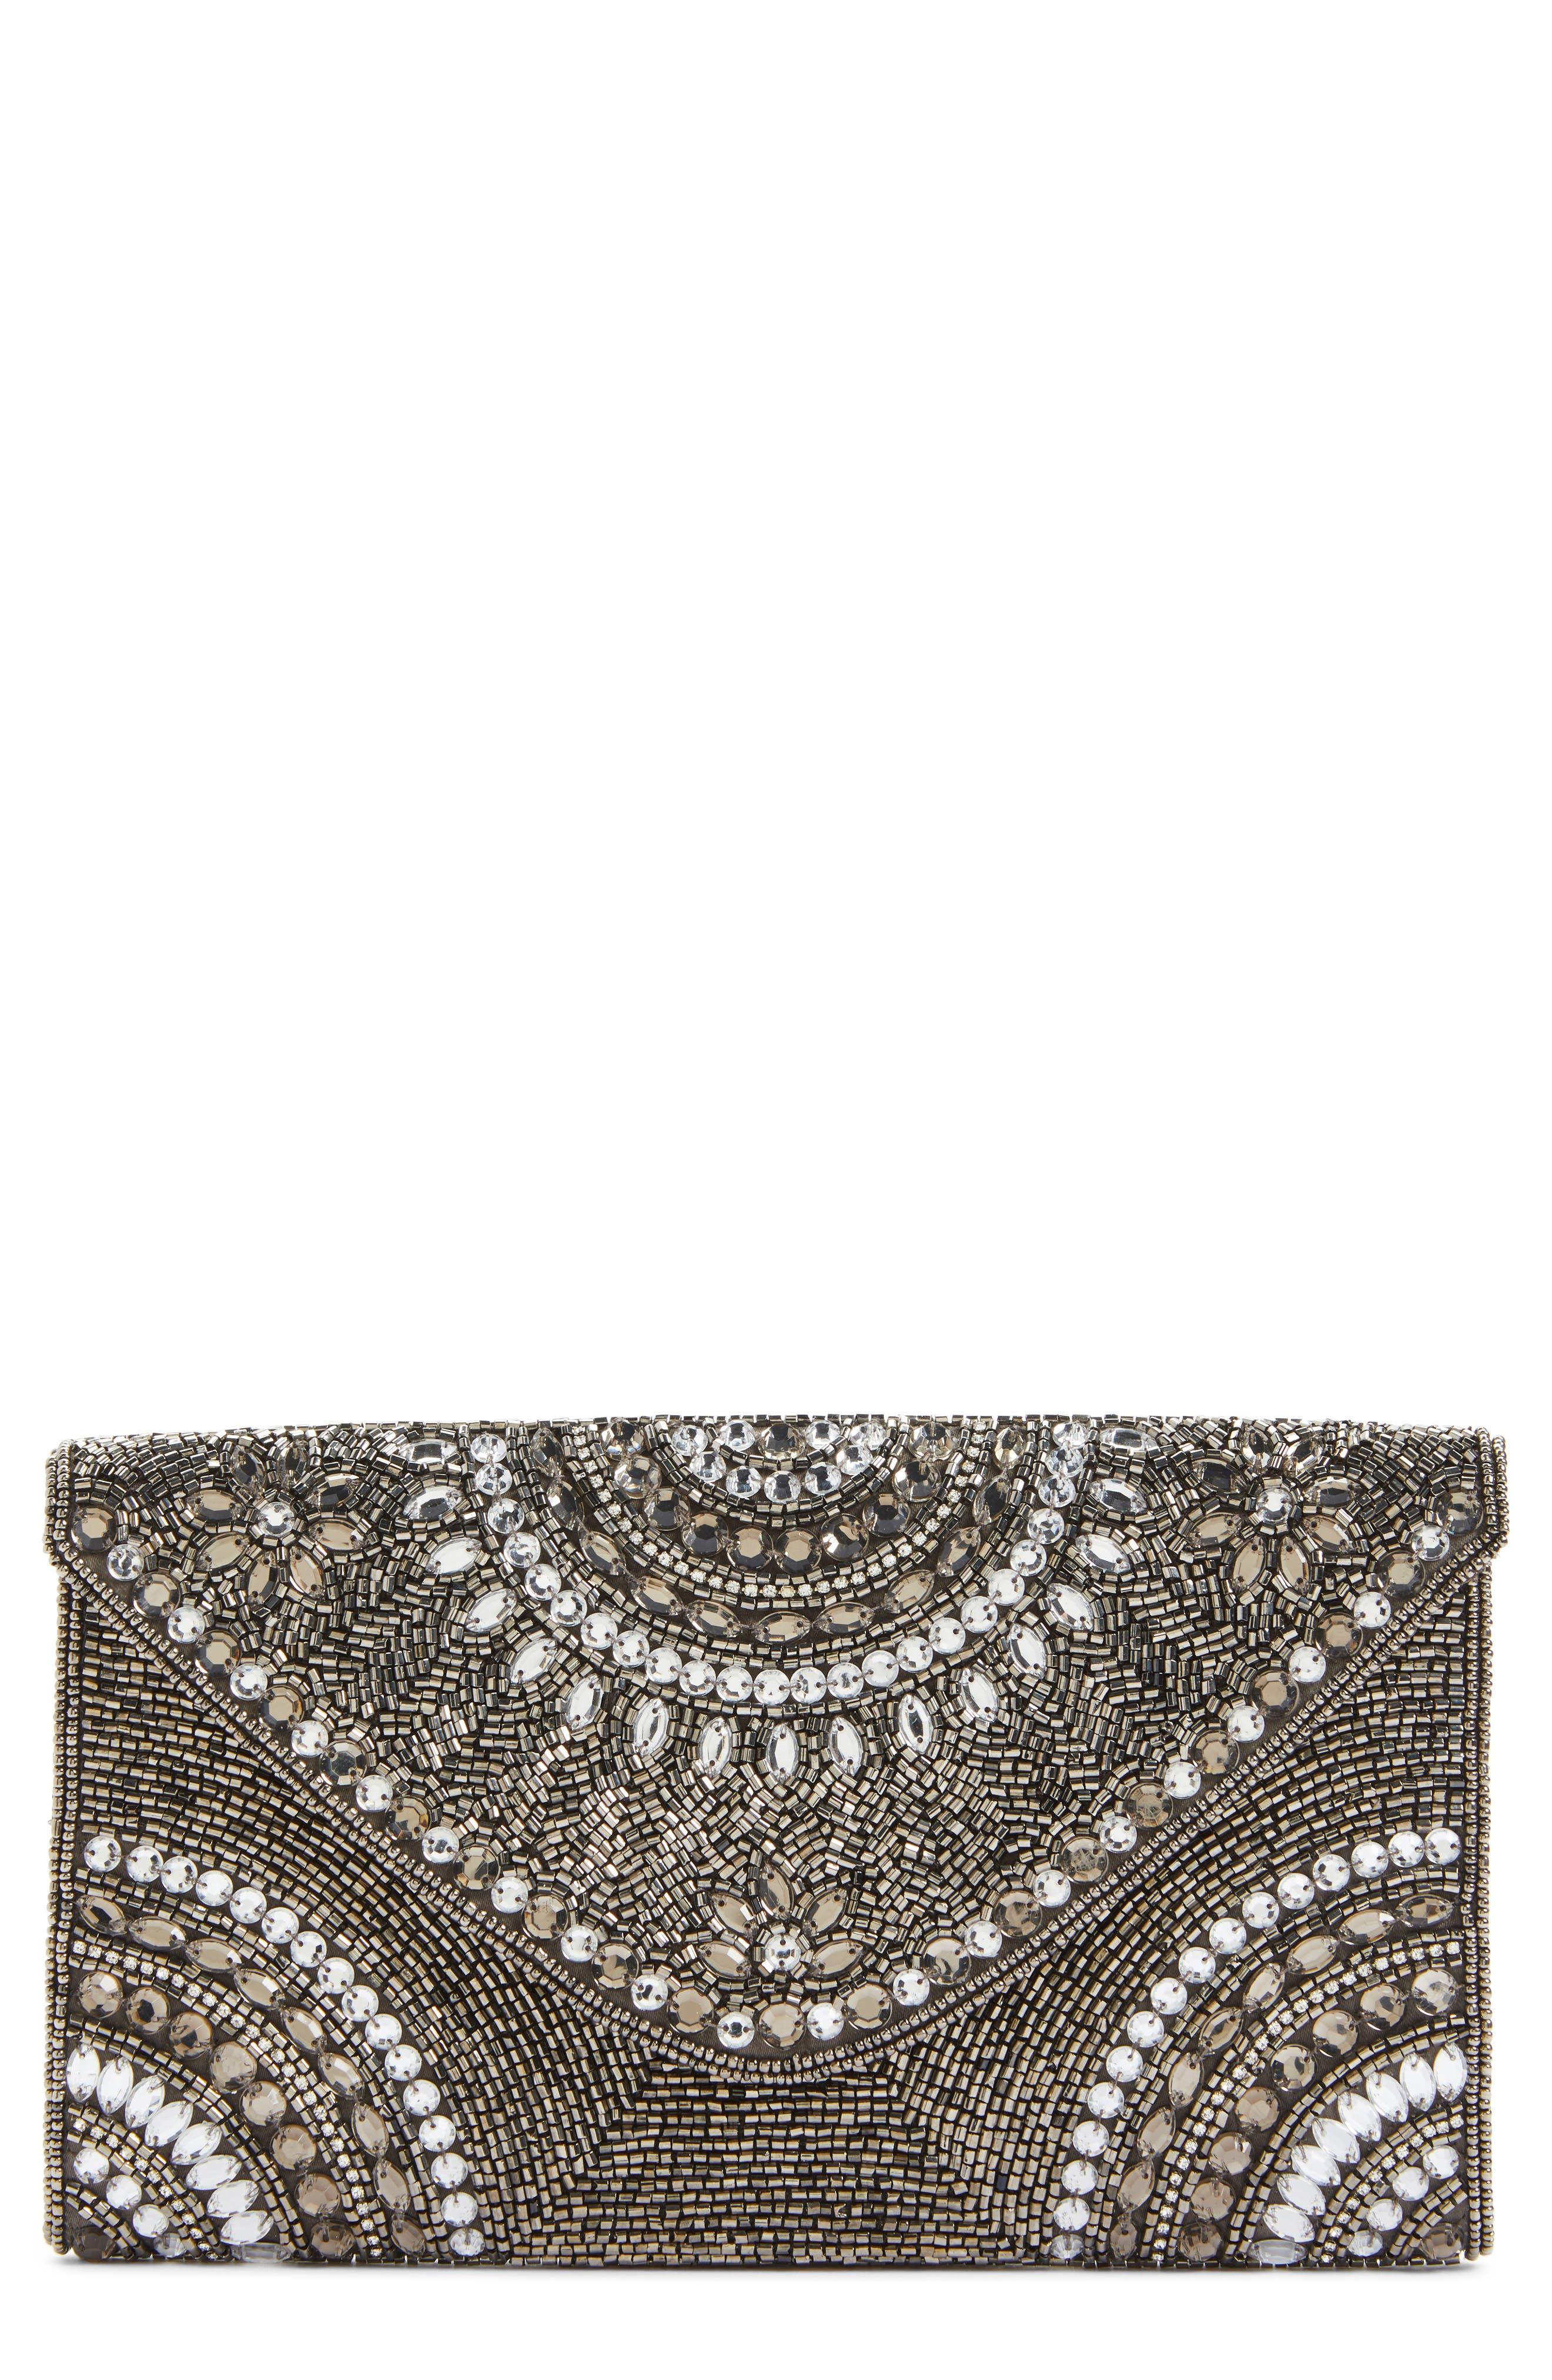 Main Image - Nordstrom Alhambra Beaded Envelope Clutch